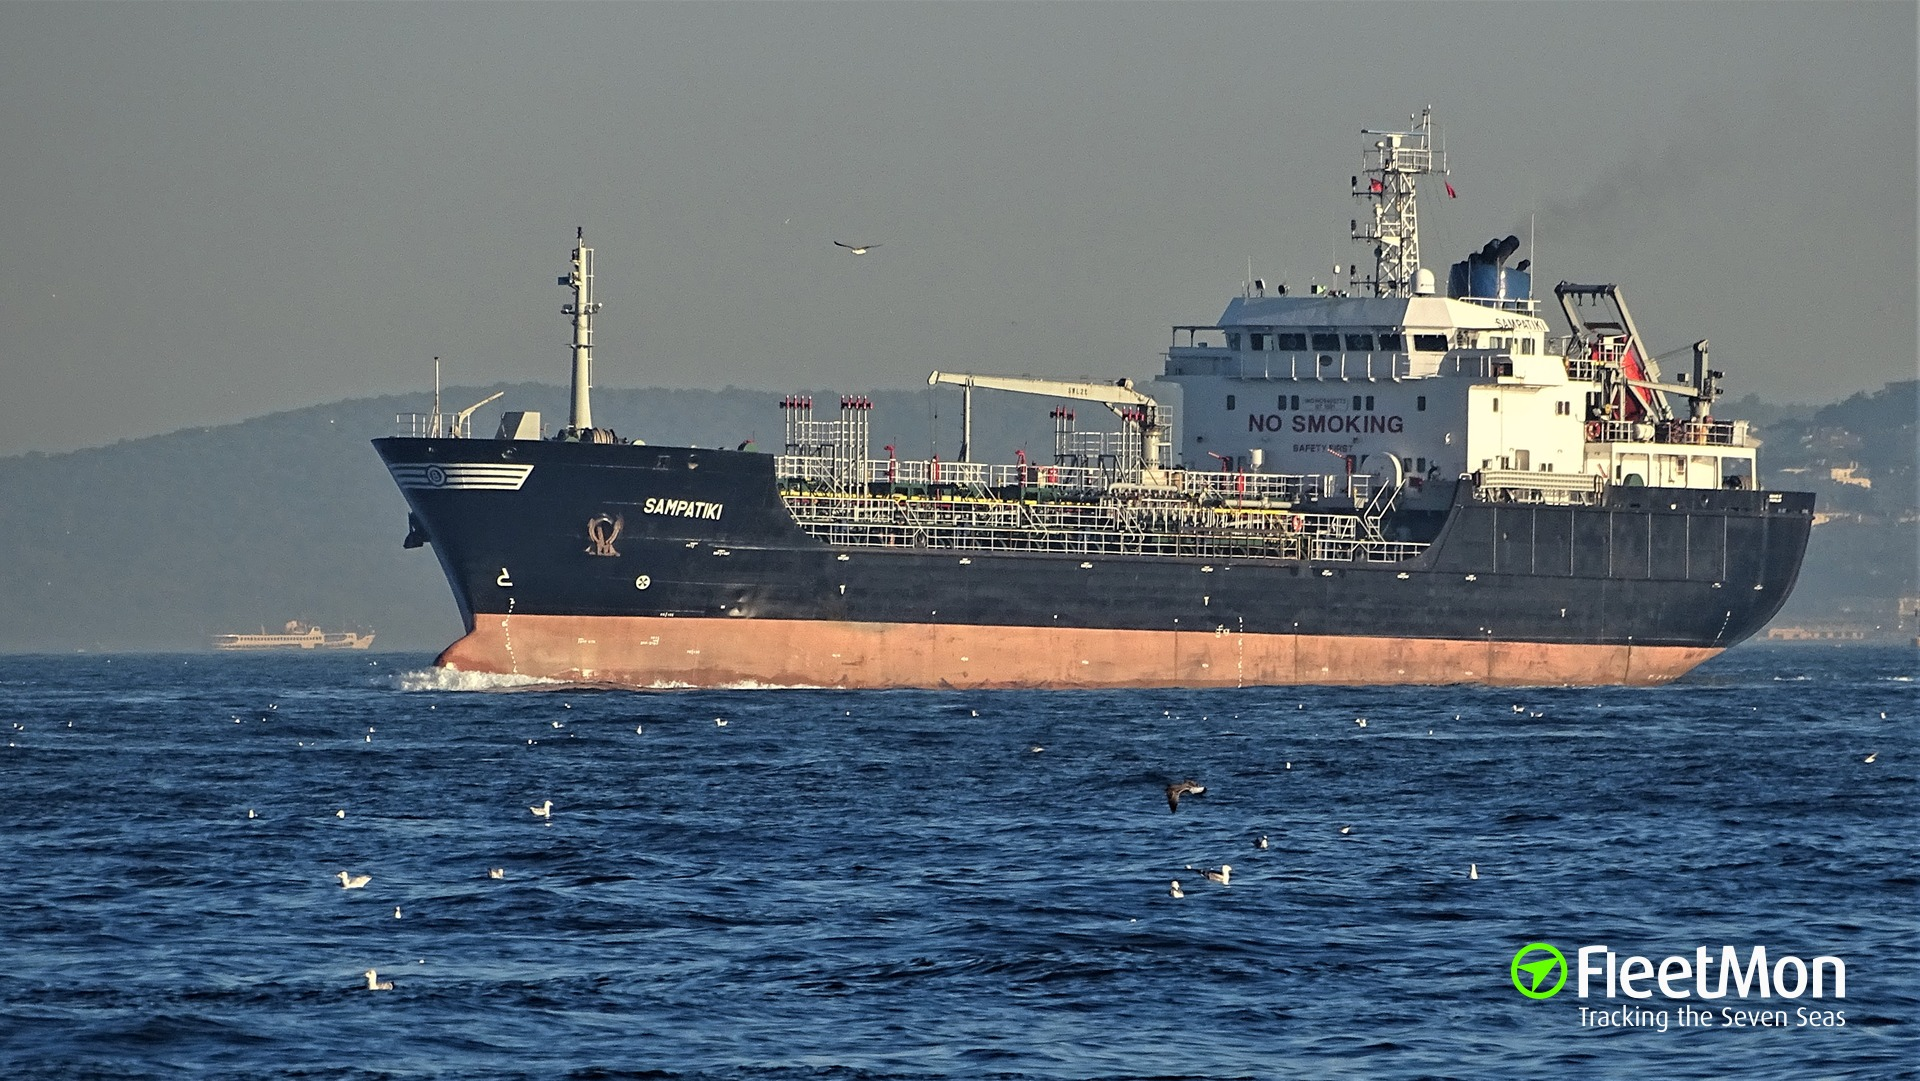 Tanker SAMPATIKI attacked, 5 crew taken hostages, Nigeria